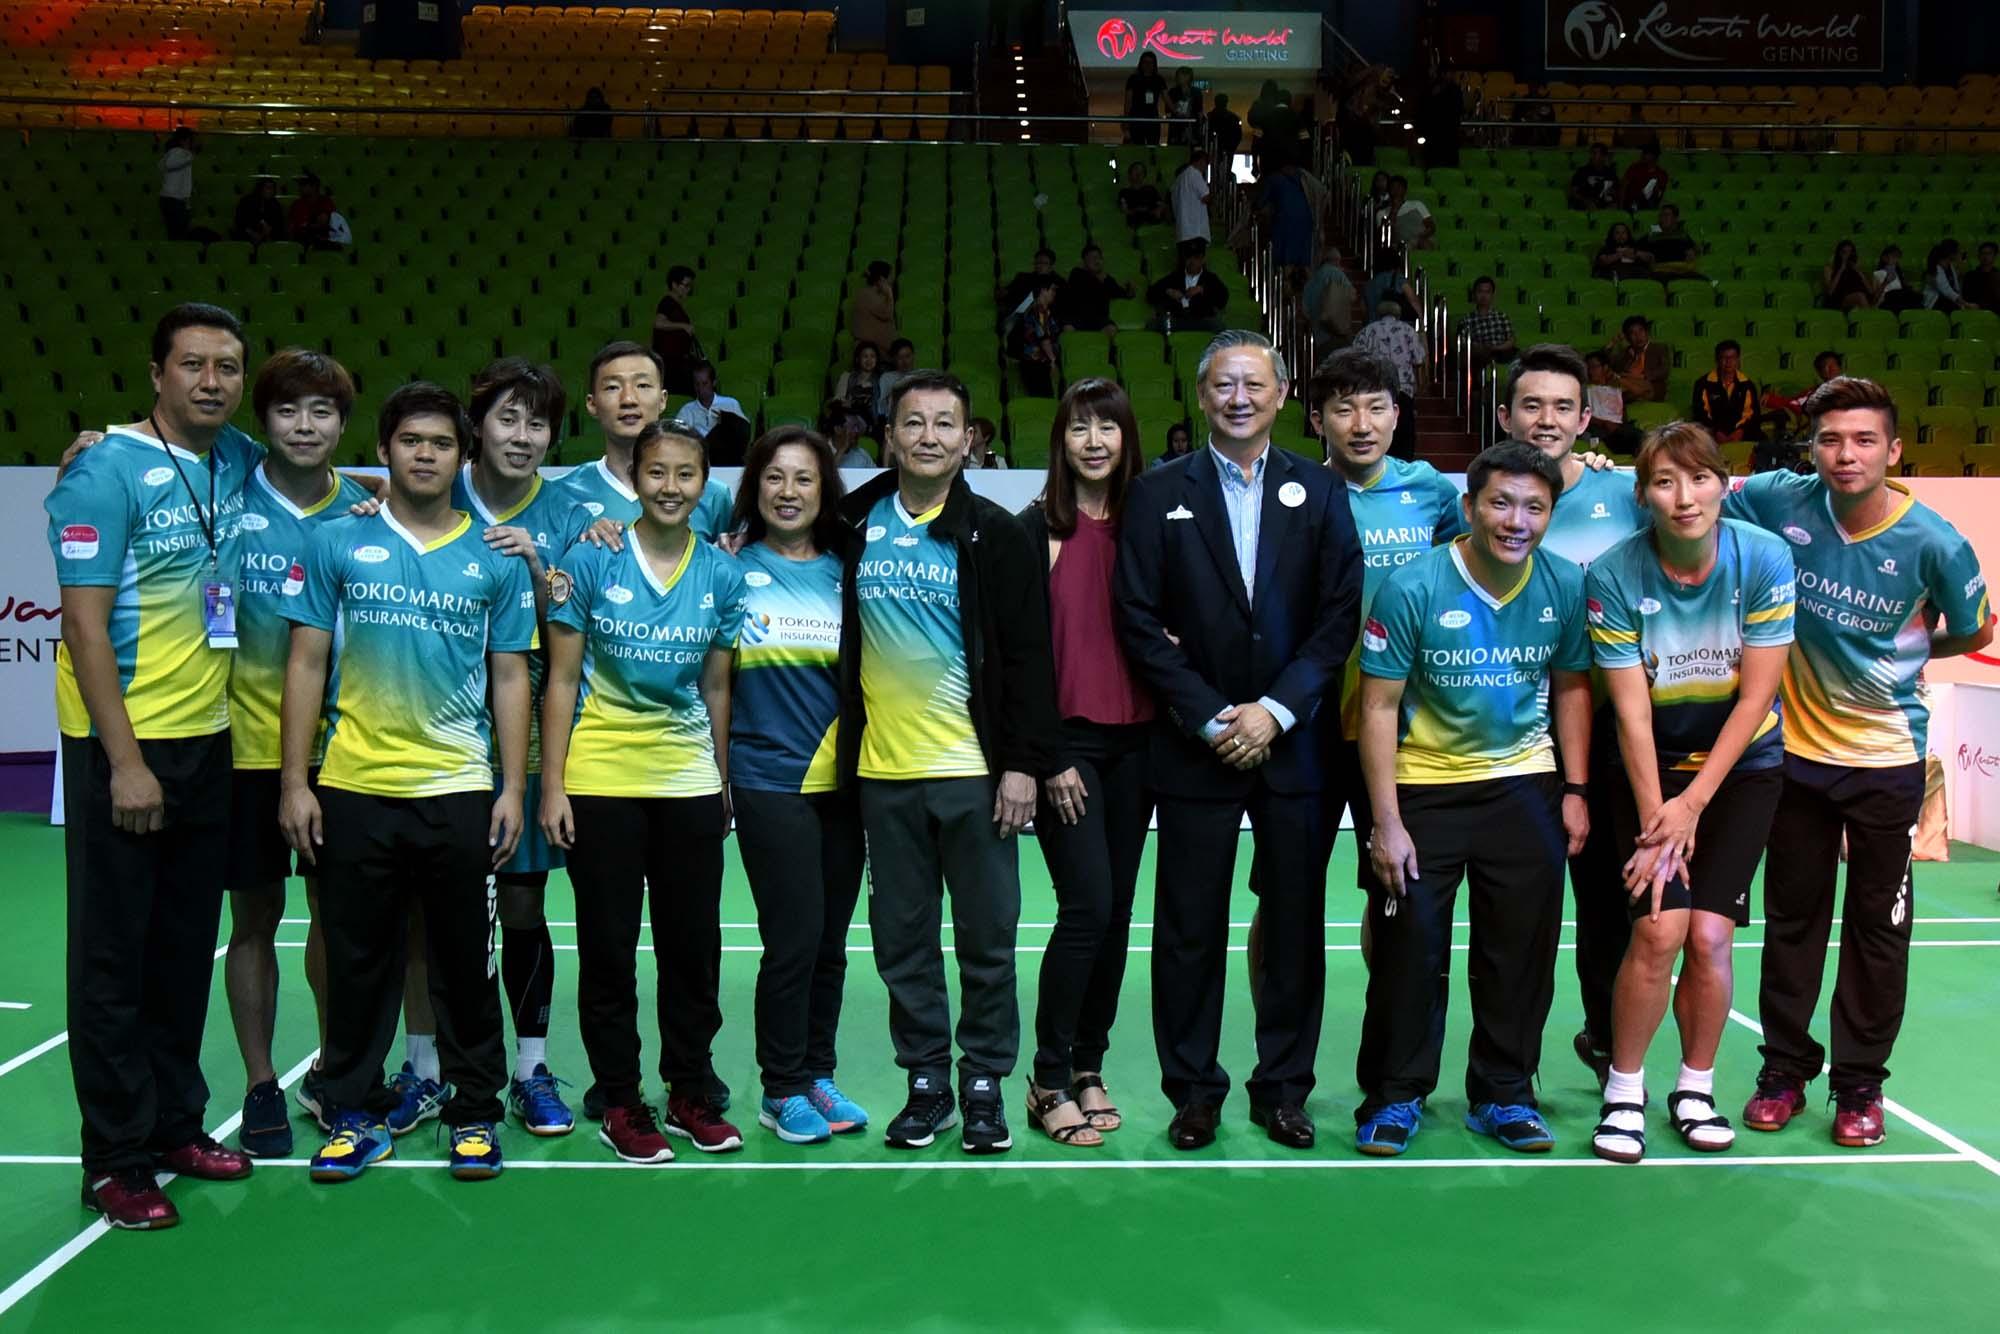 Resorts World Genting Champions Challenge - Muar City Badminton Club - Team lineup. Photo Credit - www.1titan.com